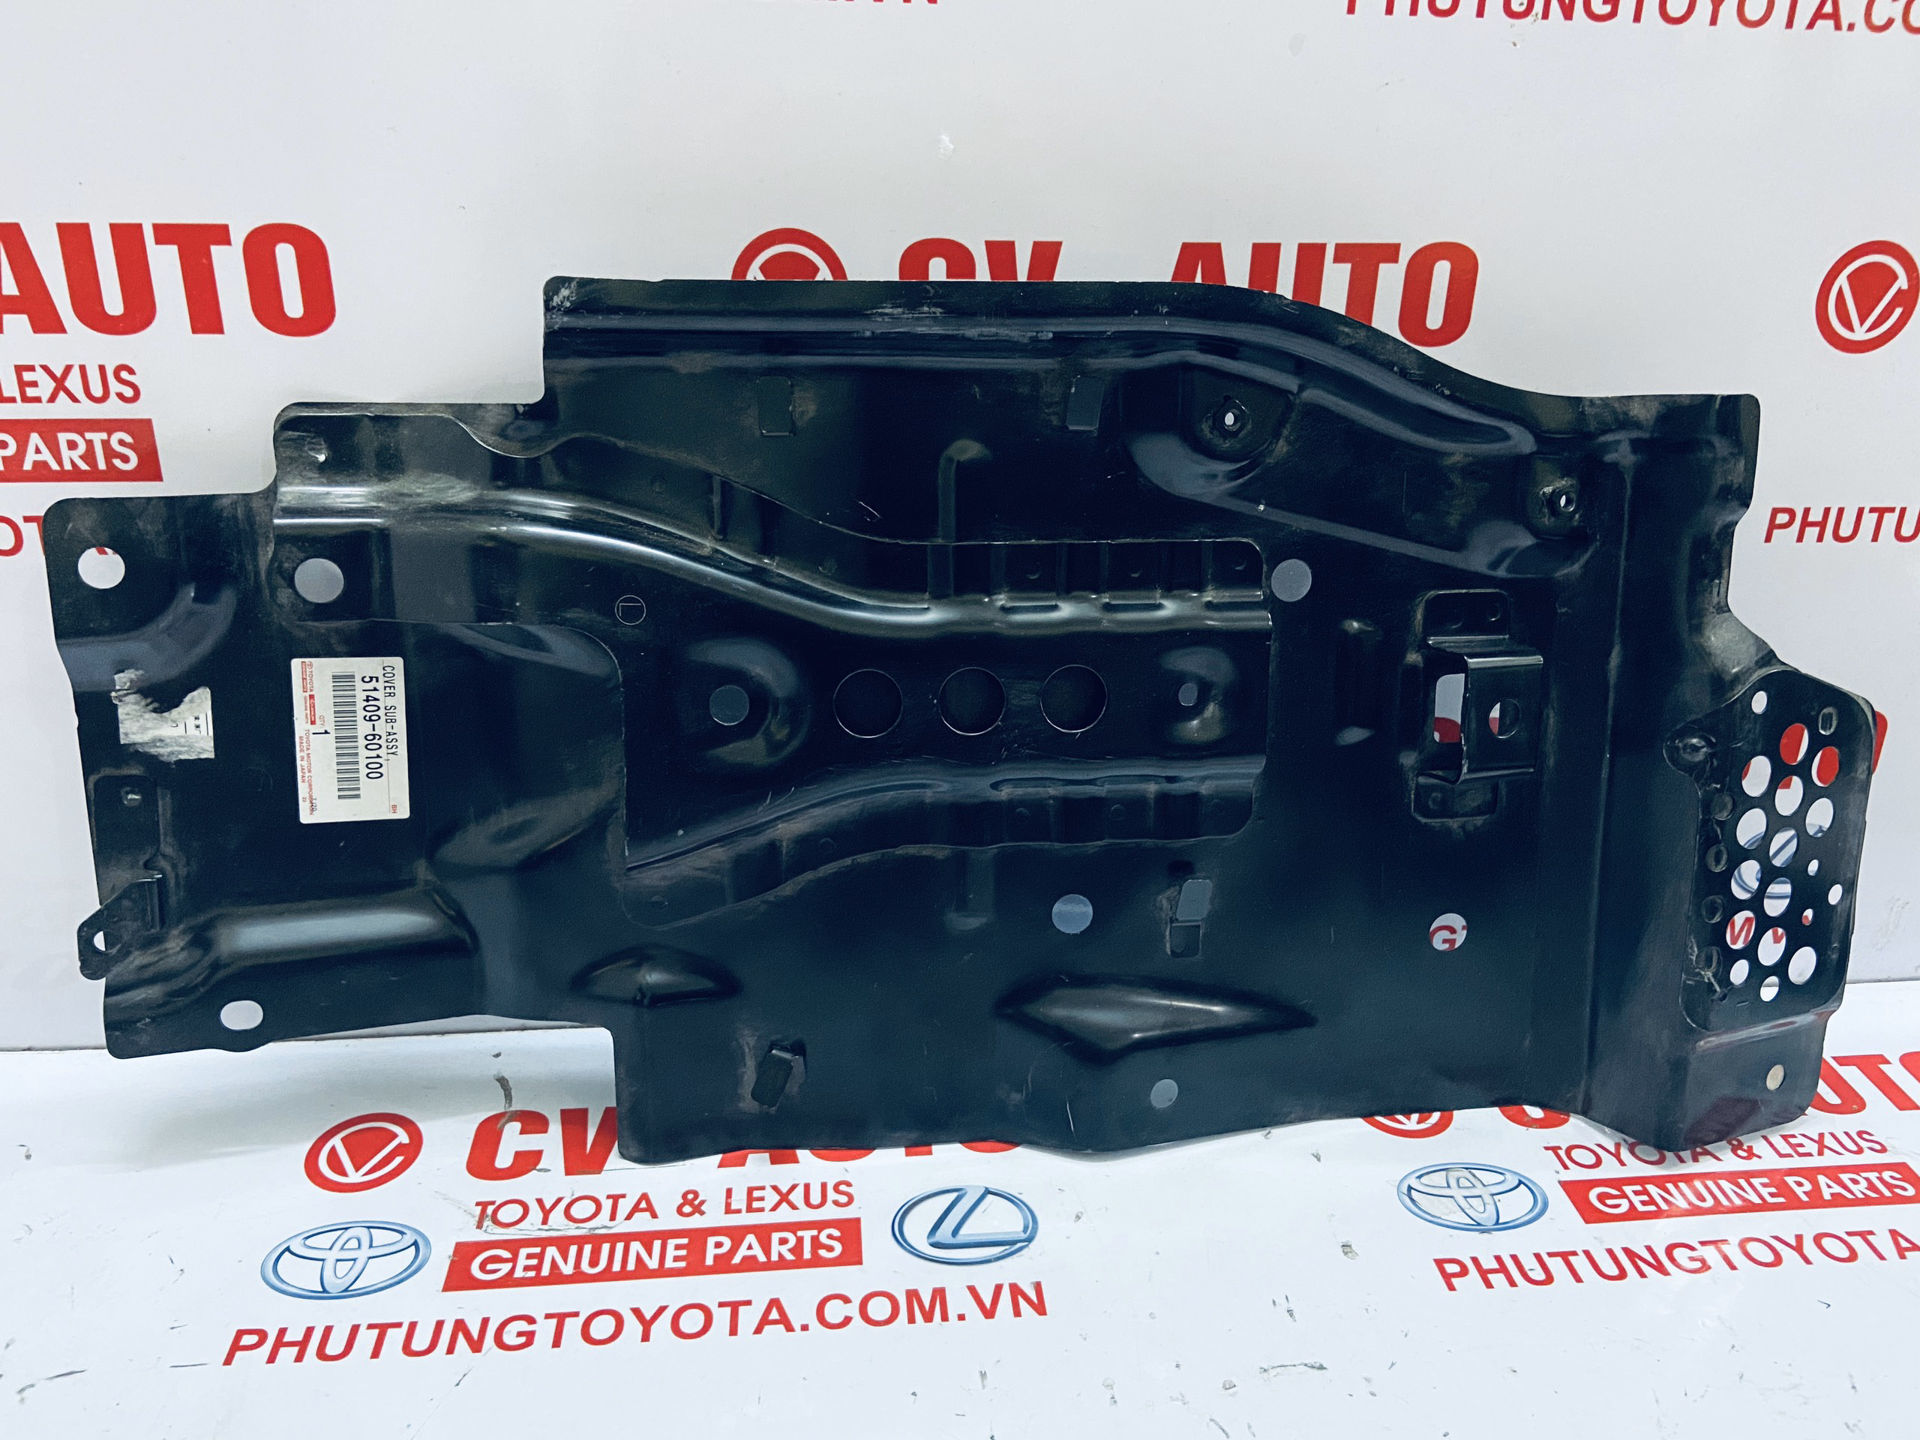 Picture of 51409-60100 Chắn bùn gầm máy Lexus LX570, Toyota Land Cruiser Prado